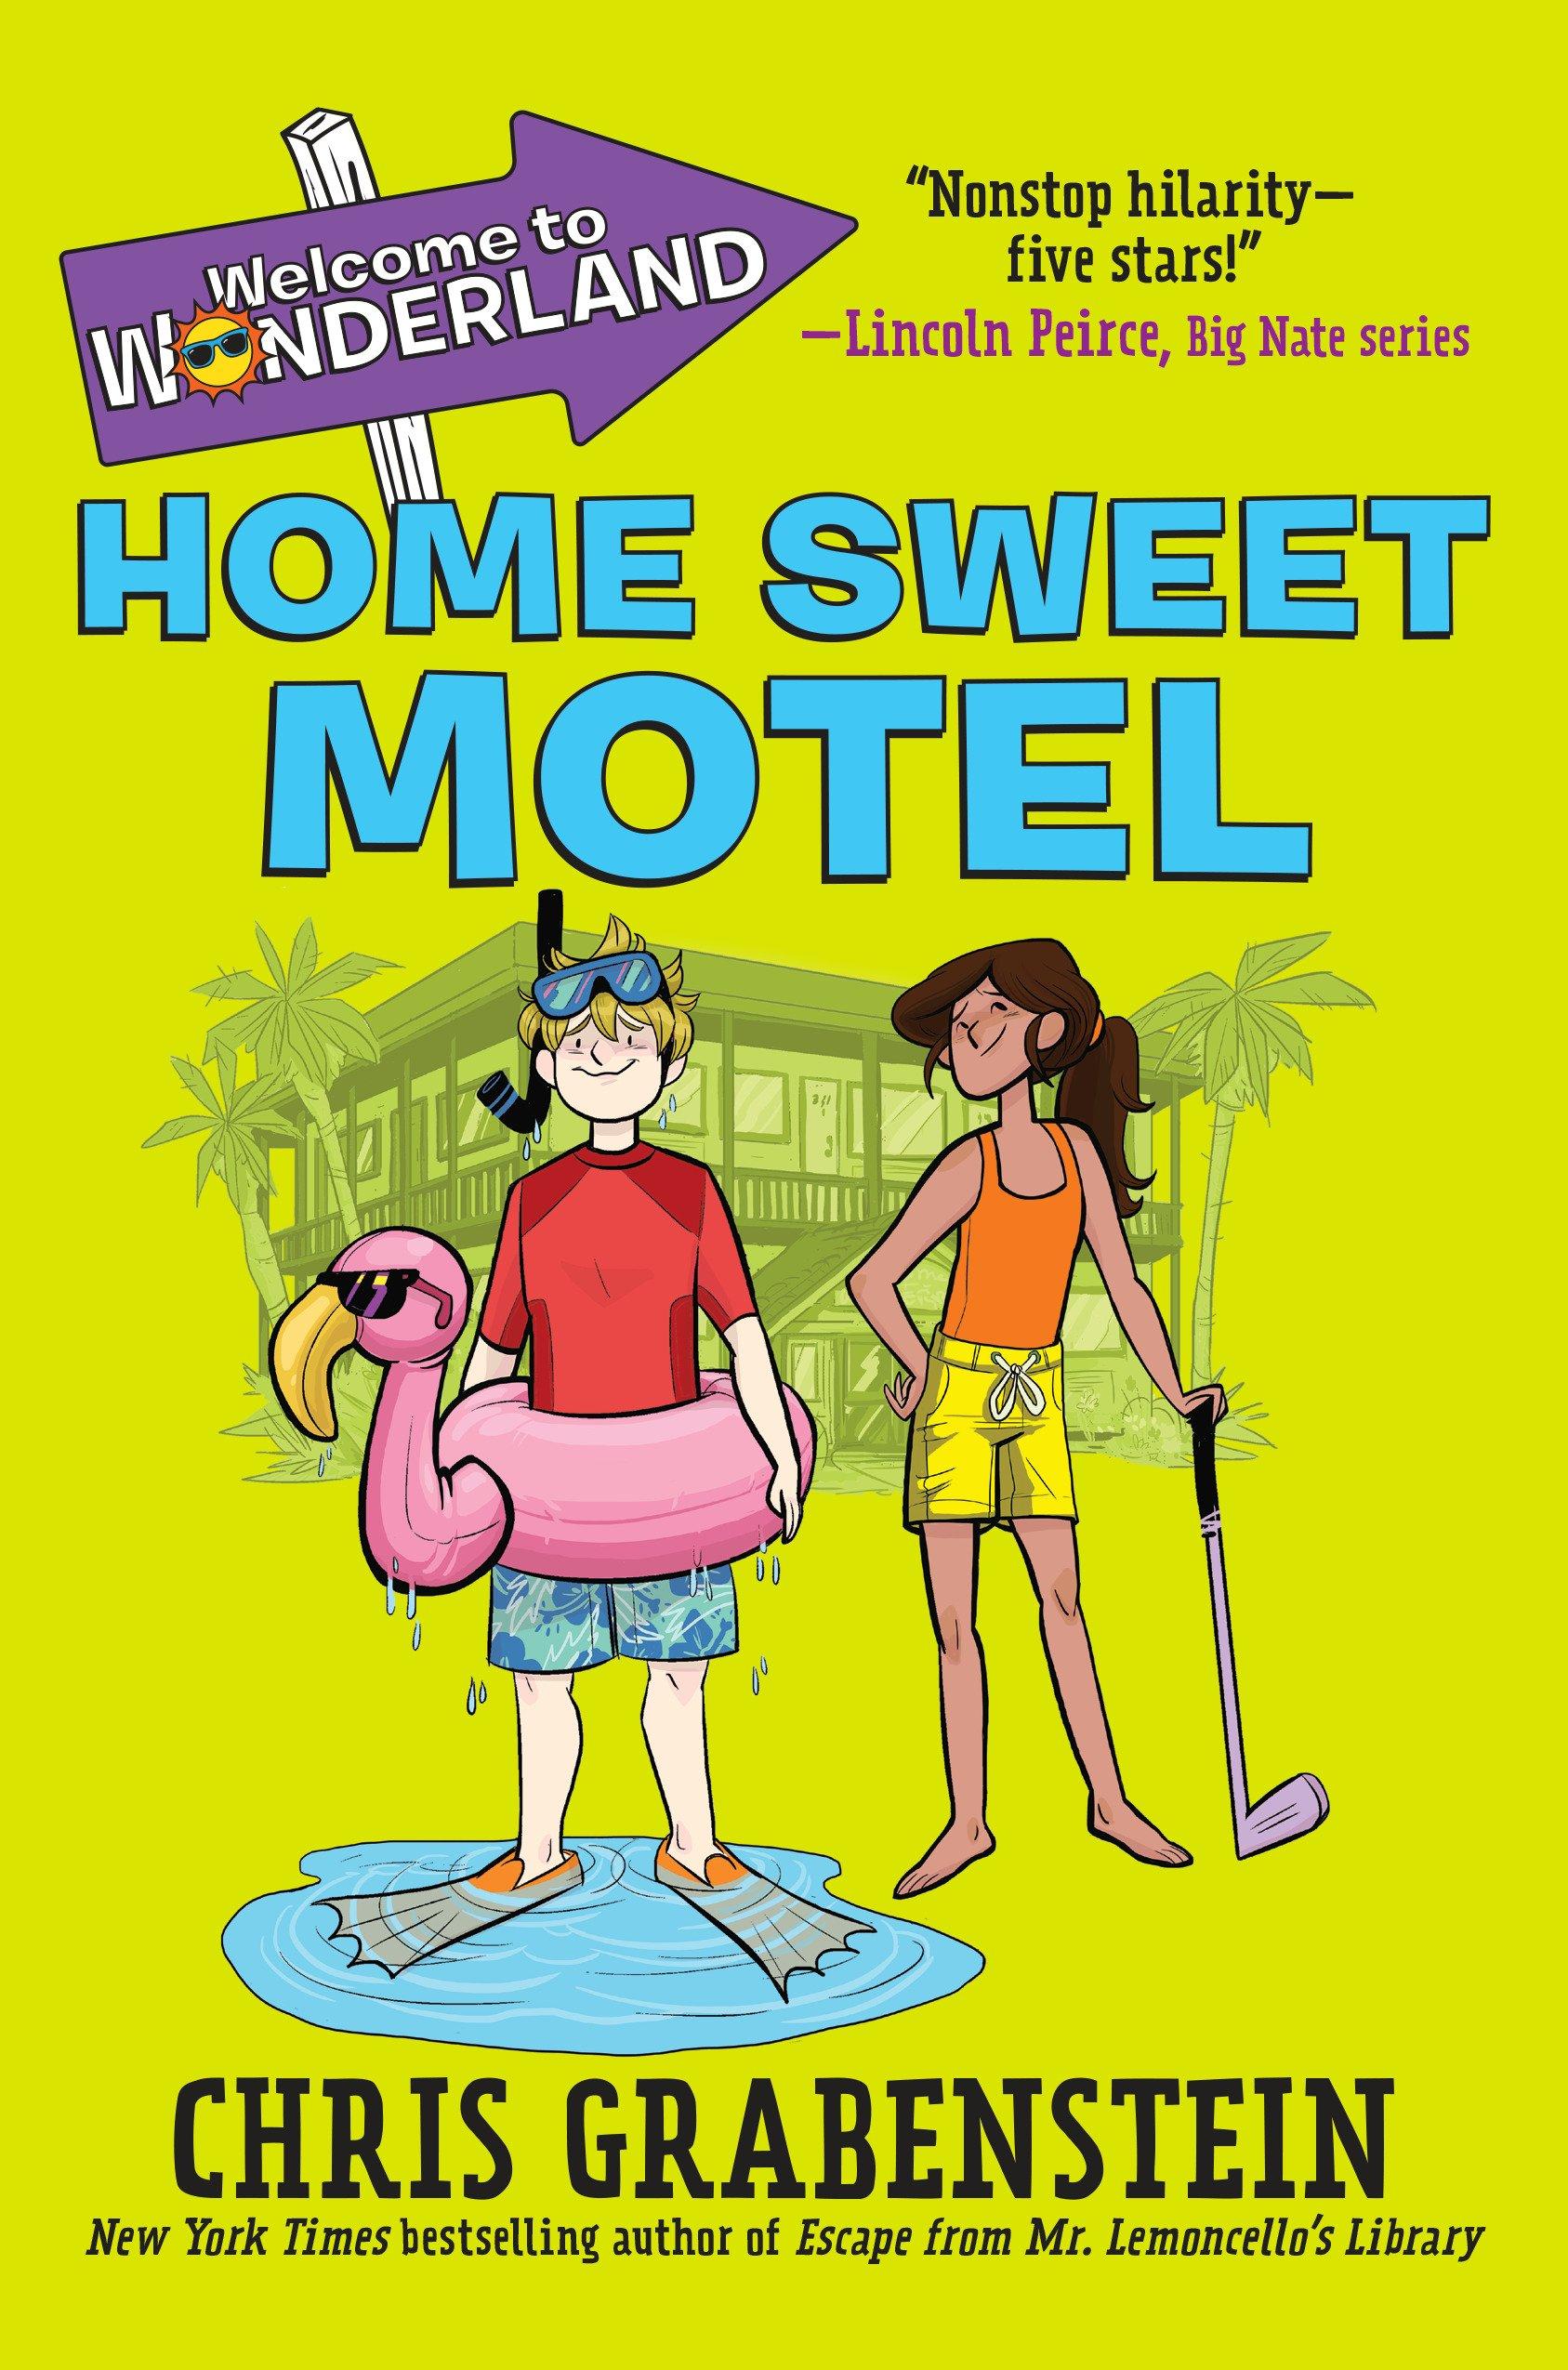 Welcome to Wonderland #1: Home Sweet Motel pdf